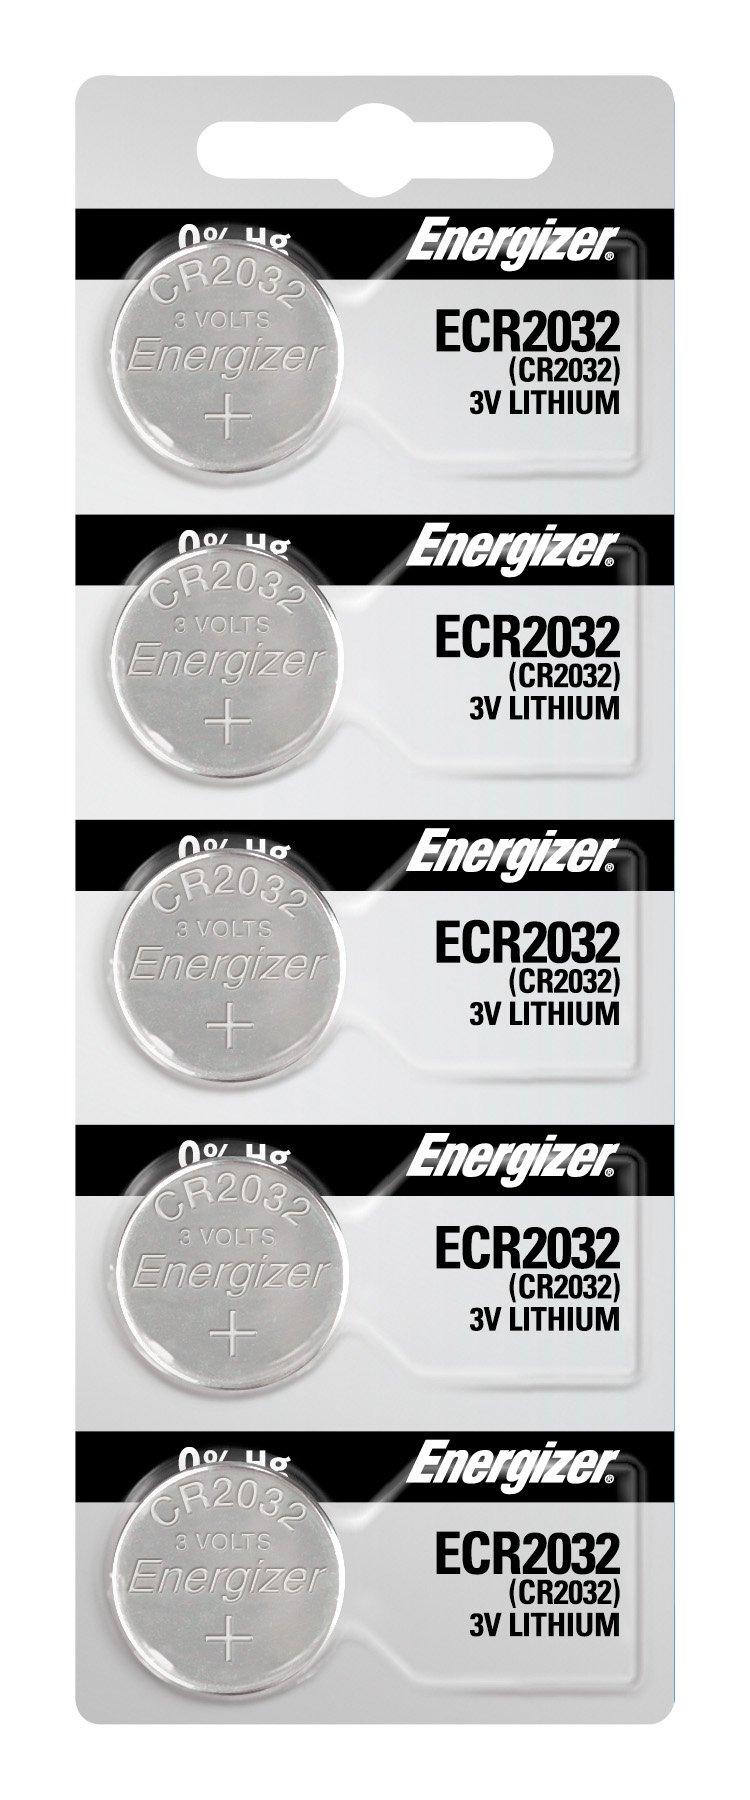 Energizer 2032 Battery CR2032 Lithium 3v (1 Pack of 5)